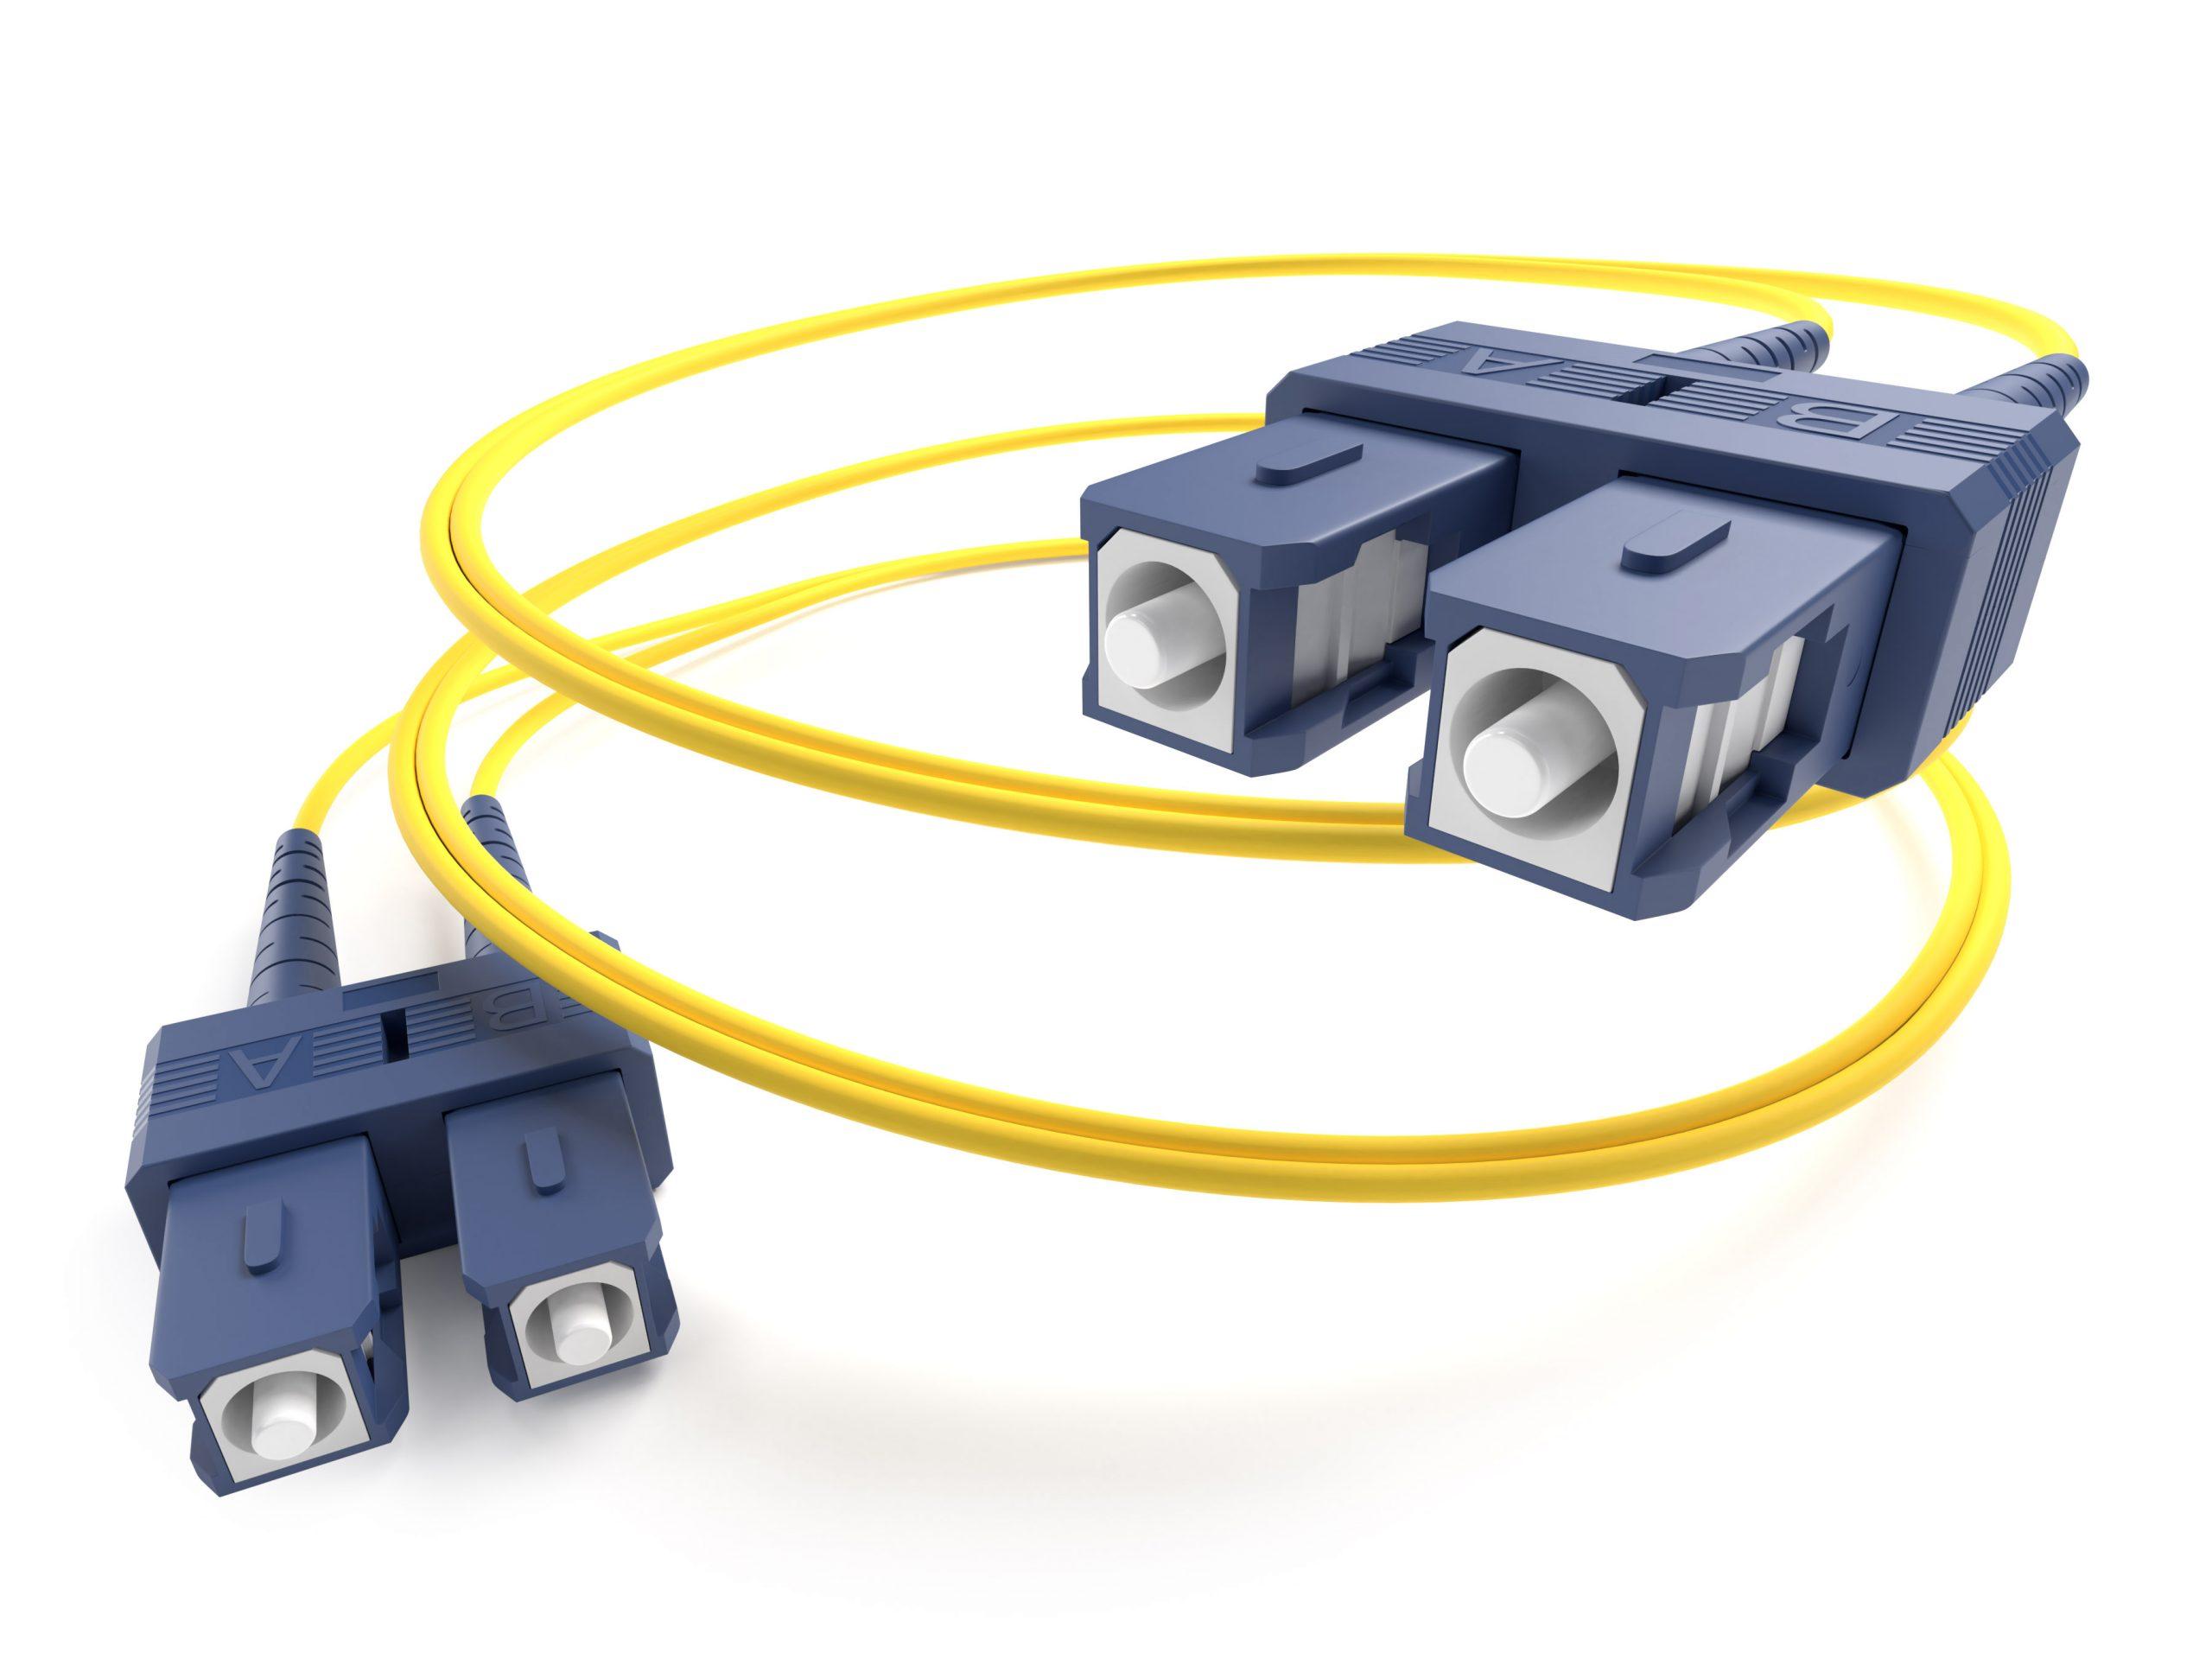 image of a singlemode SC-SC fiber optic cable